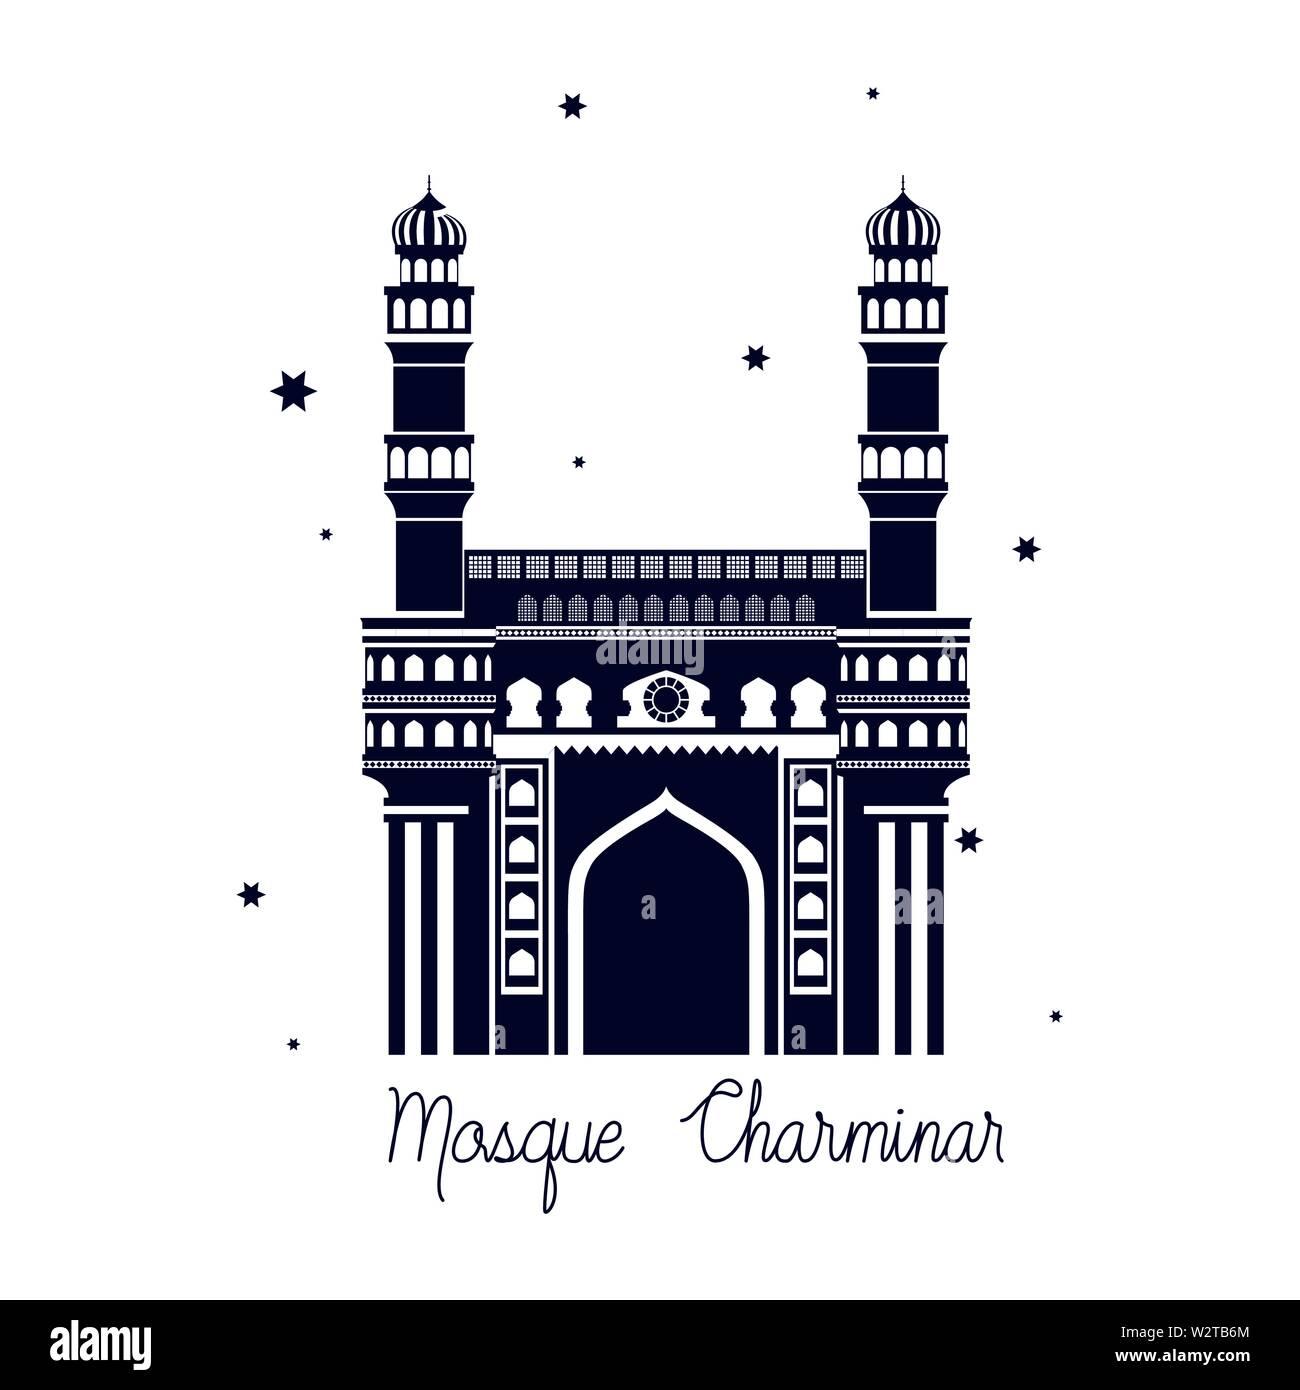 Mosque Font Stock Photos & Mosque Font Stock Images - Alamy